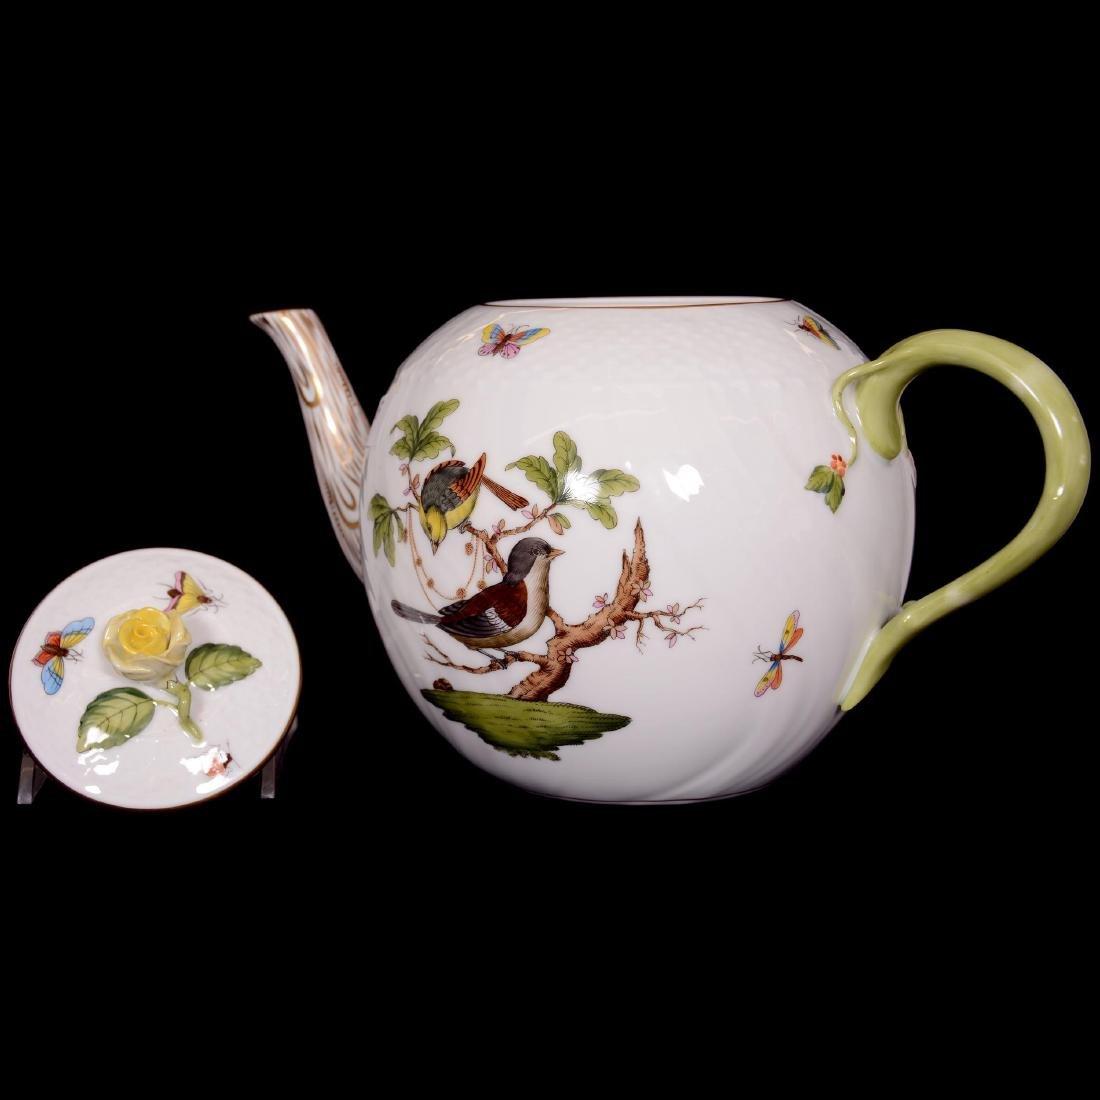 Herend Hungary Porcelain Hand Painted Fifteen Piece Tea - 2